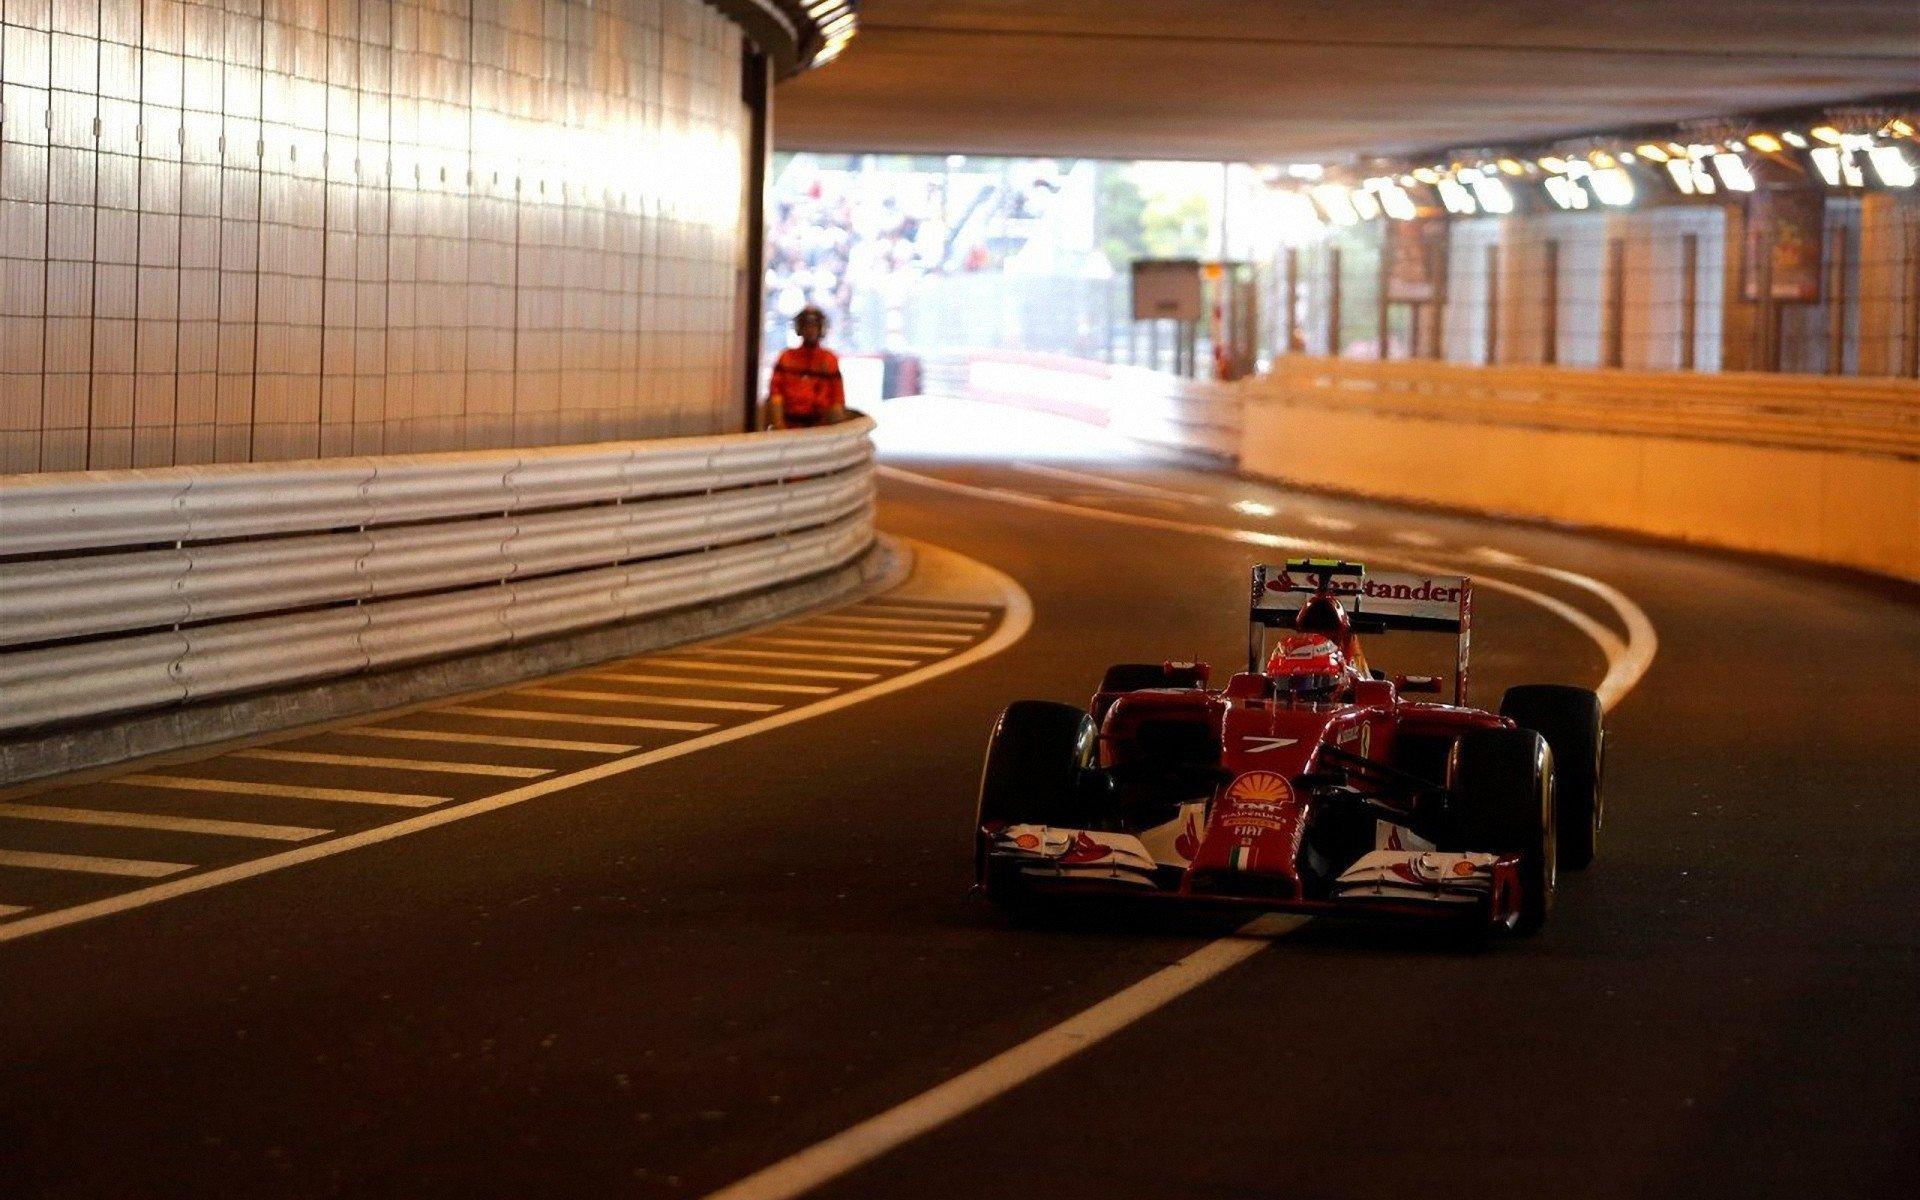 Kimi Raikkonen Scuderia Ferrari Monaco Formula 1 Italy Hd Wallpapers Desktop And Mobile Images Photos